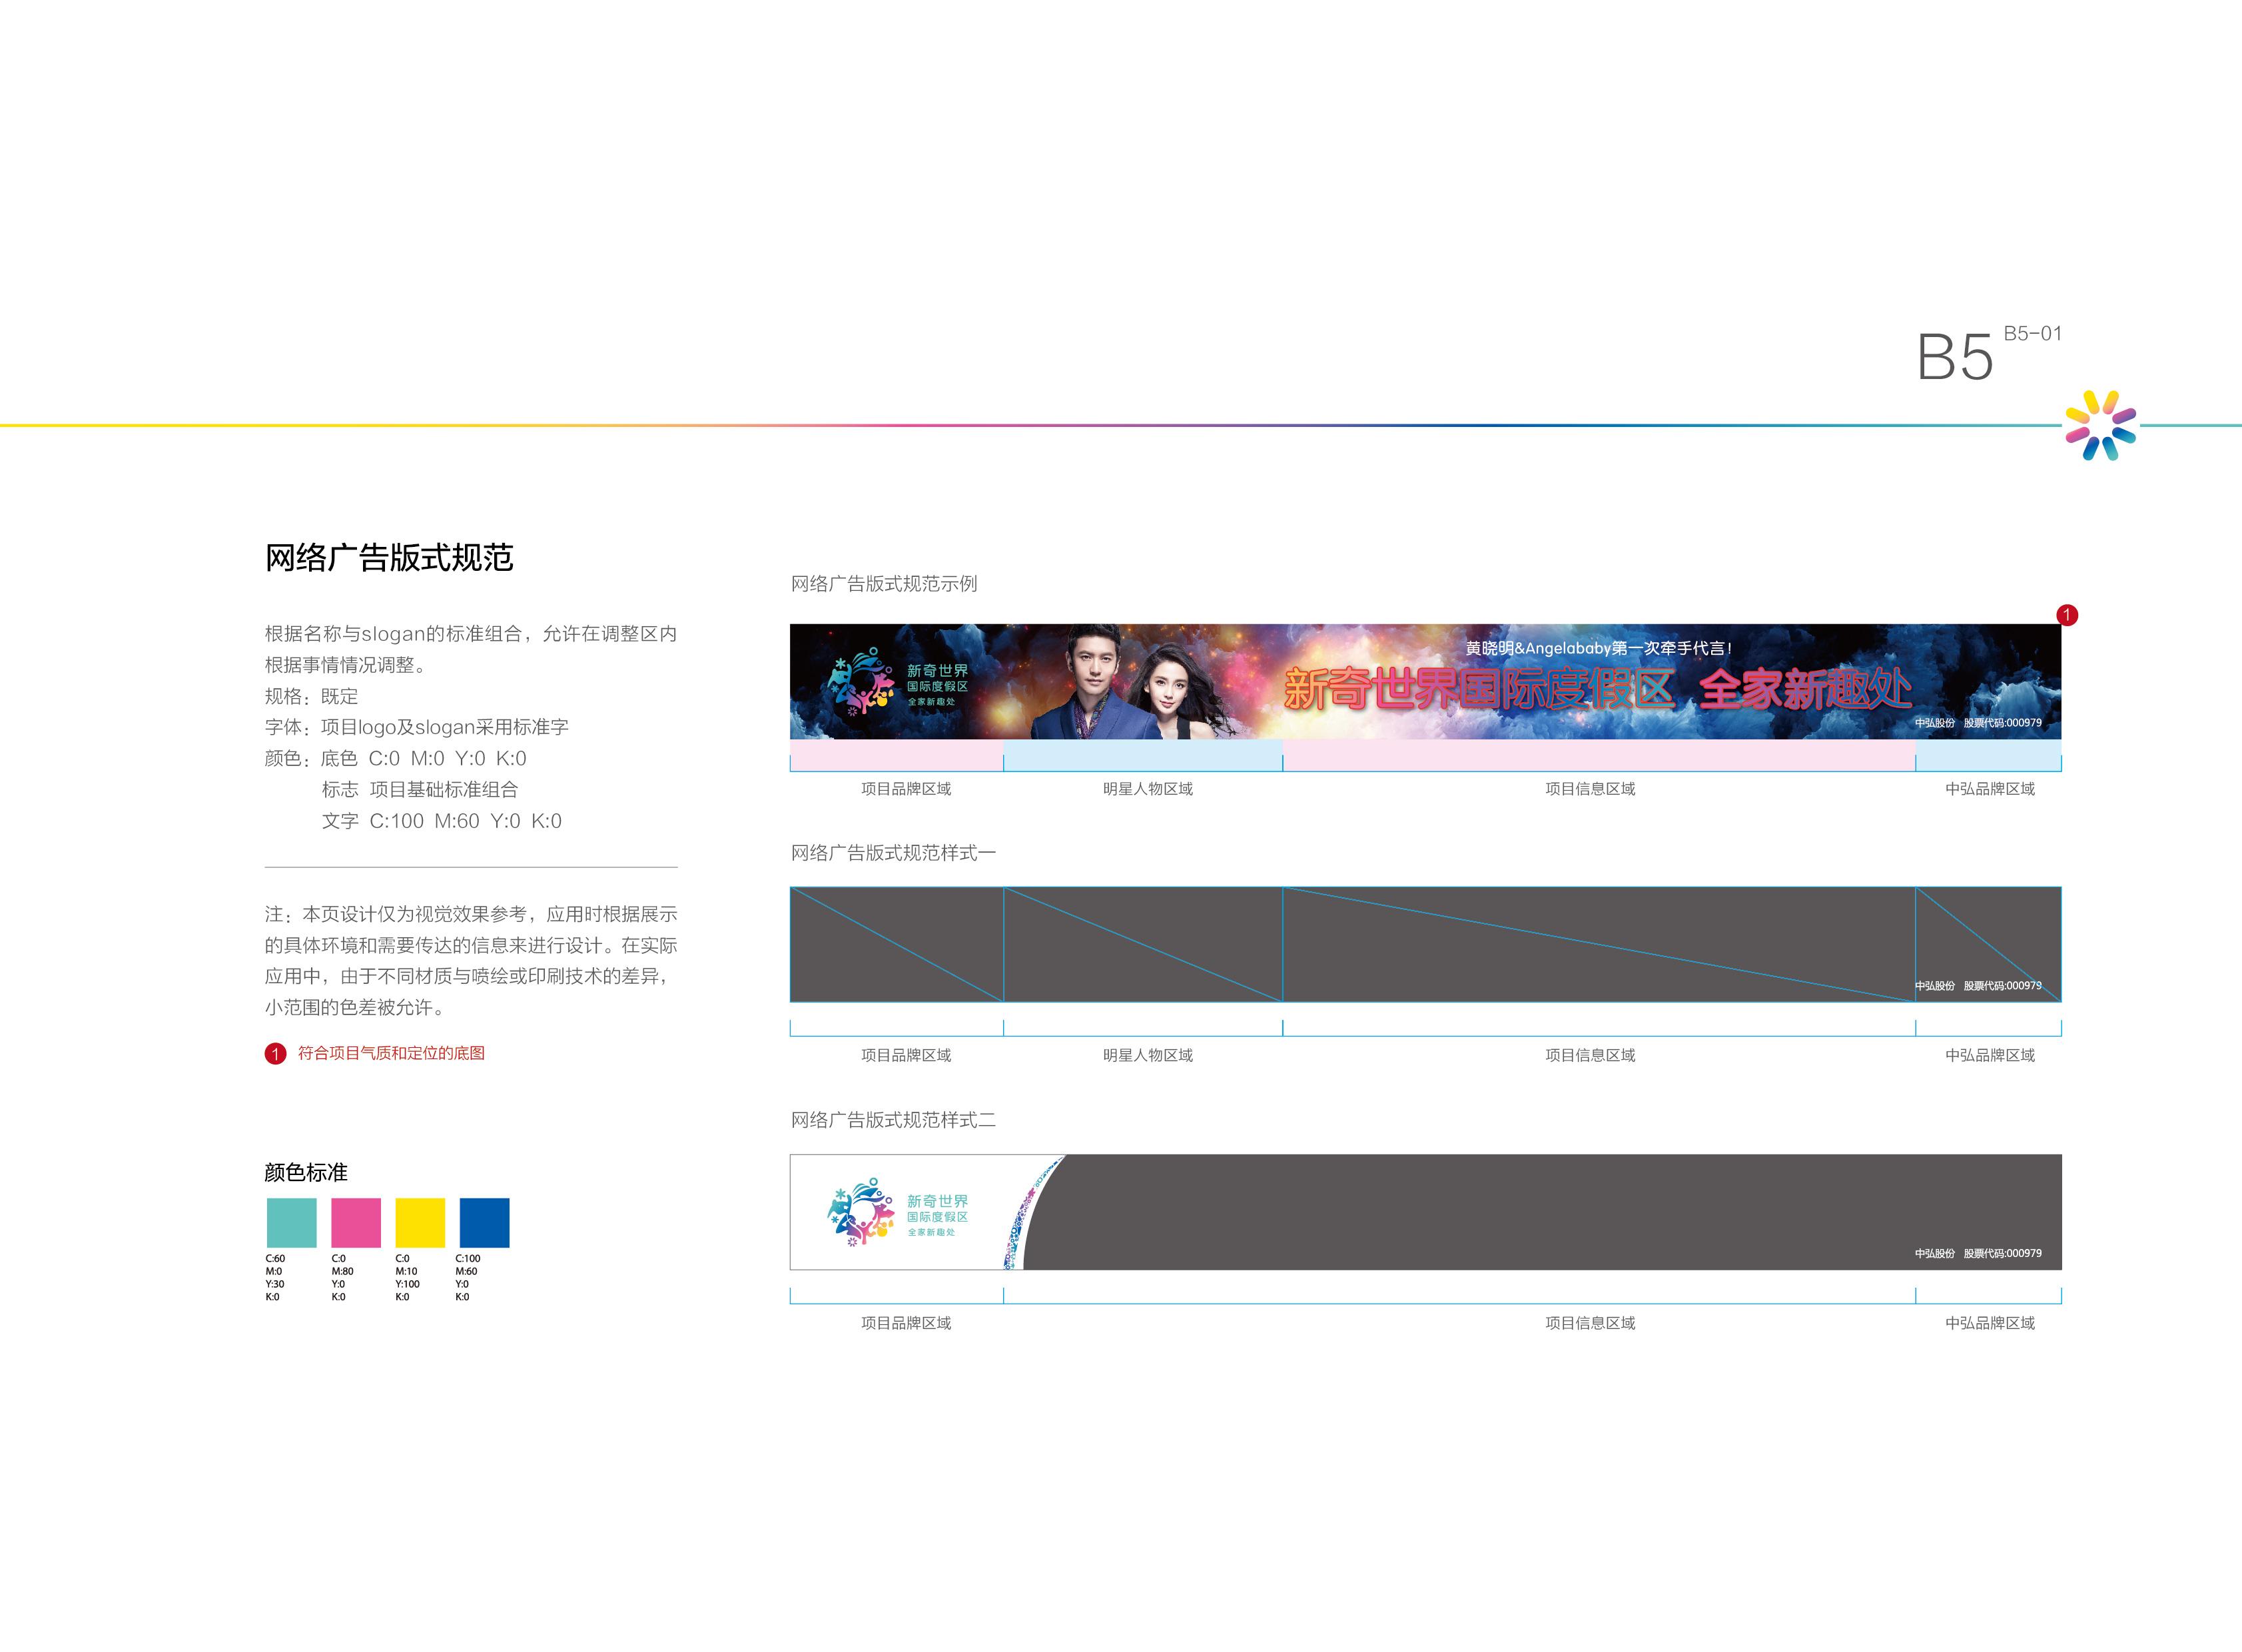 B5 网媒广告应用规范.jpg